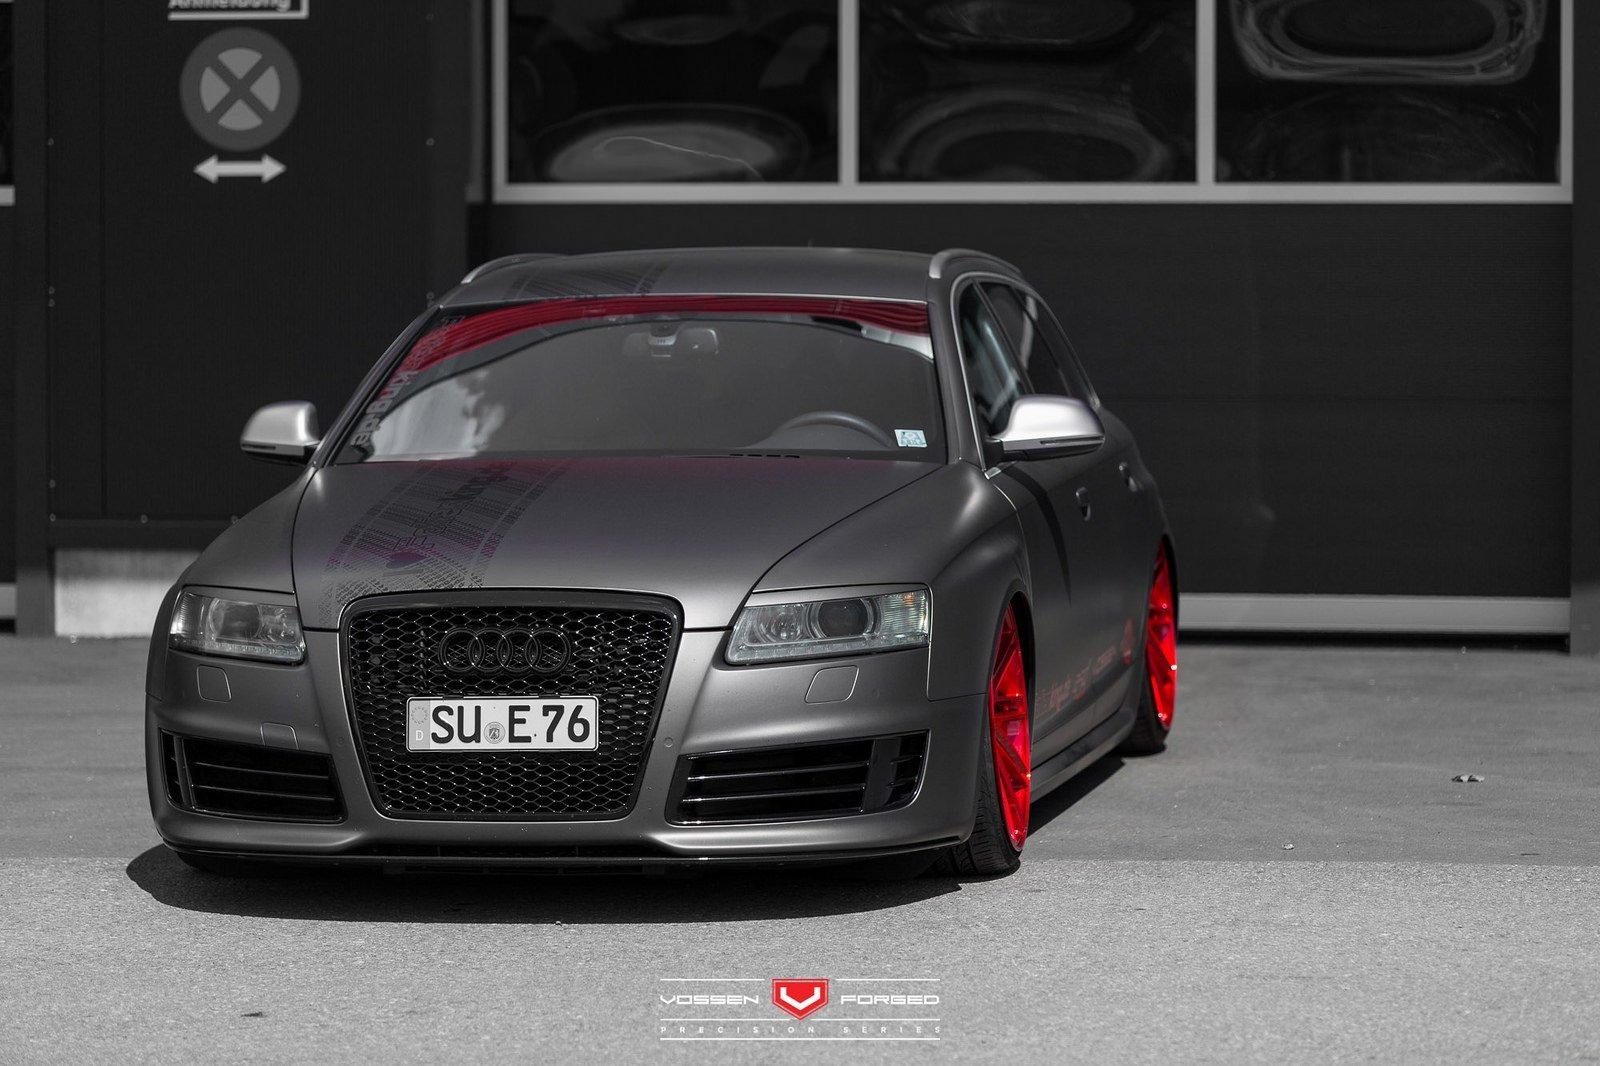 Audi Rs6 Avant Vossen Cars Wagon Black Matt Wrapp Modified